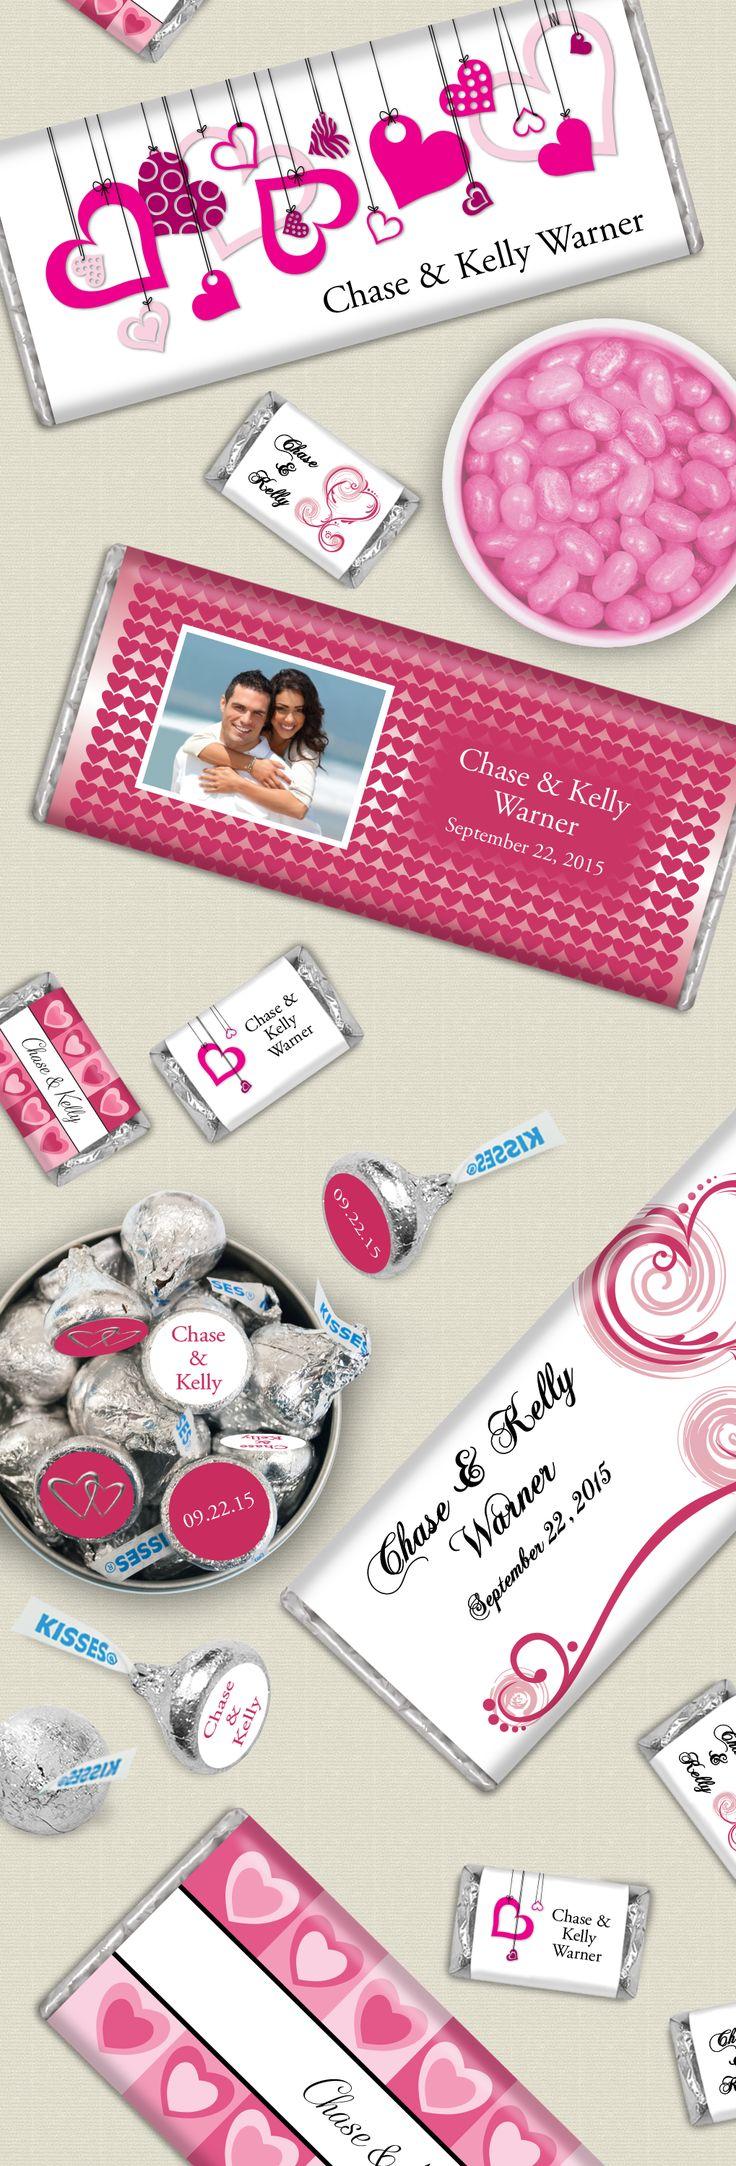 68 best wedding favors images on Pinterest   Wedding keepsakes ...